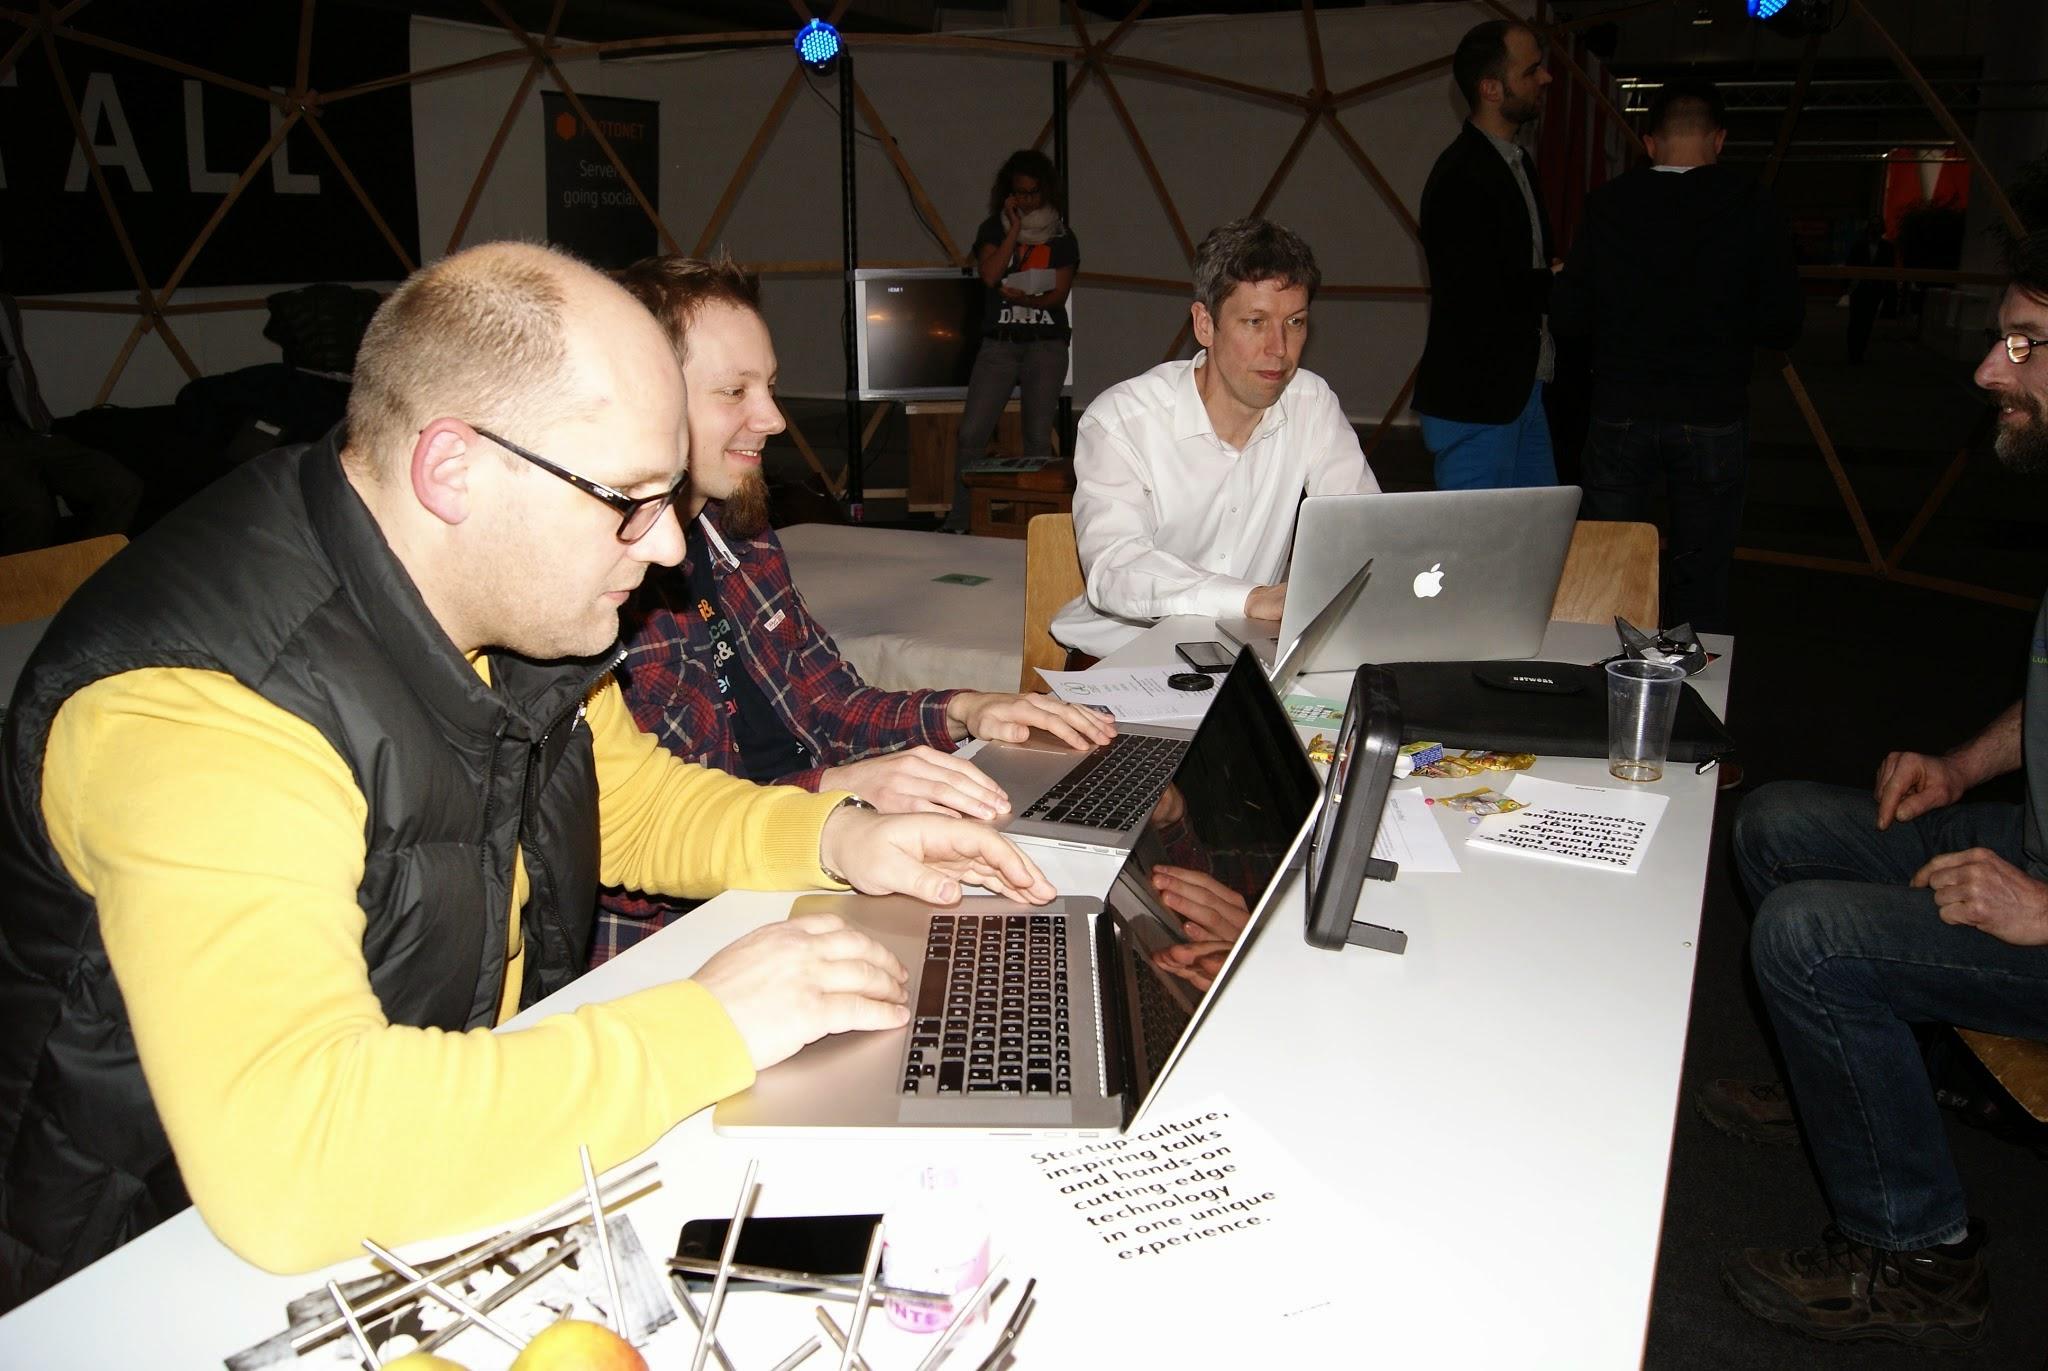 Team Lars und Helge - Coding Dojo Agile Wednesday Cebit 2014 - 5242